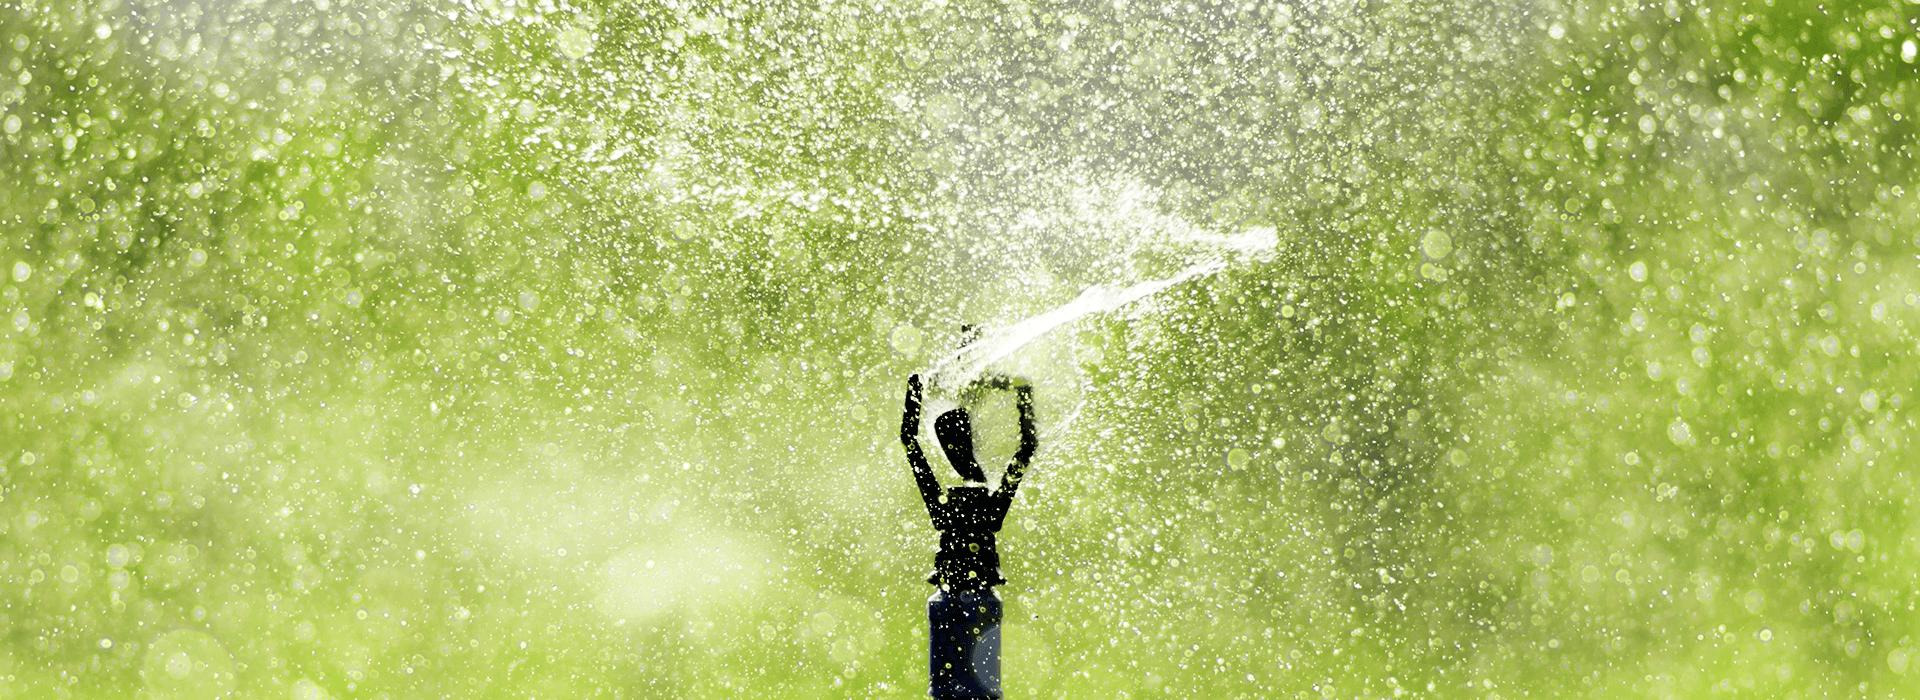 High-Quality Sprinkler